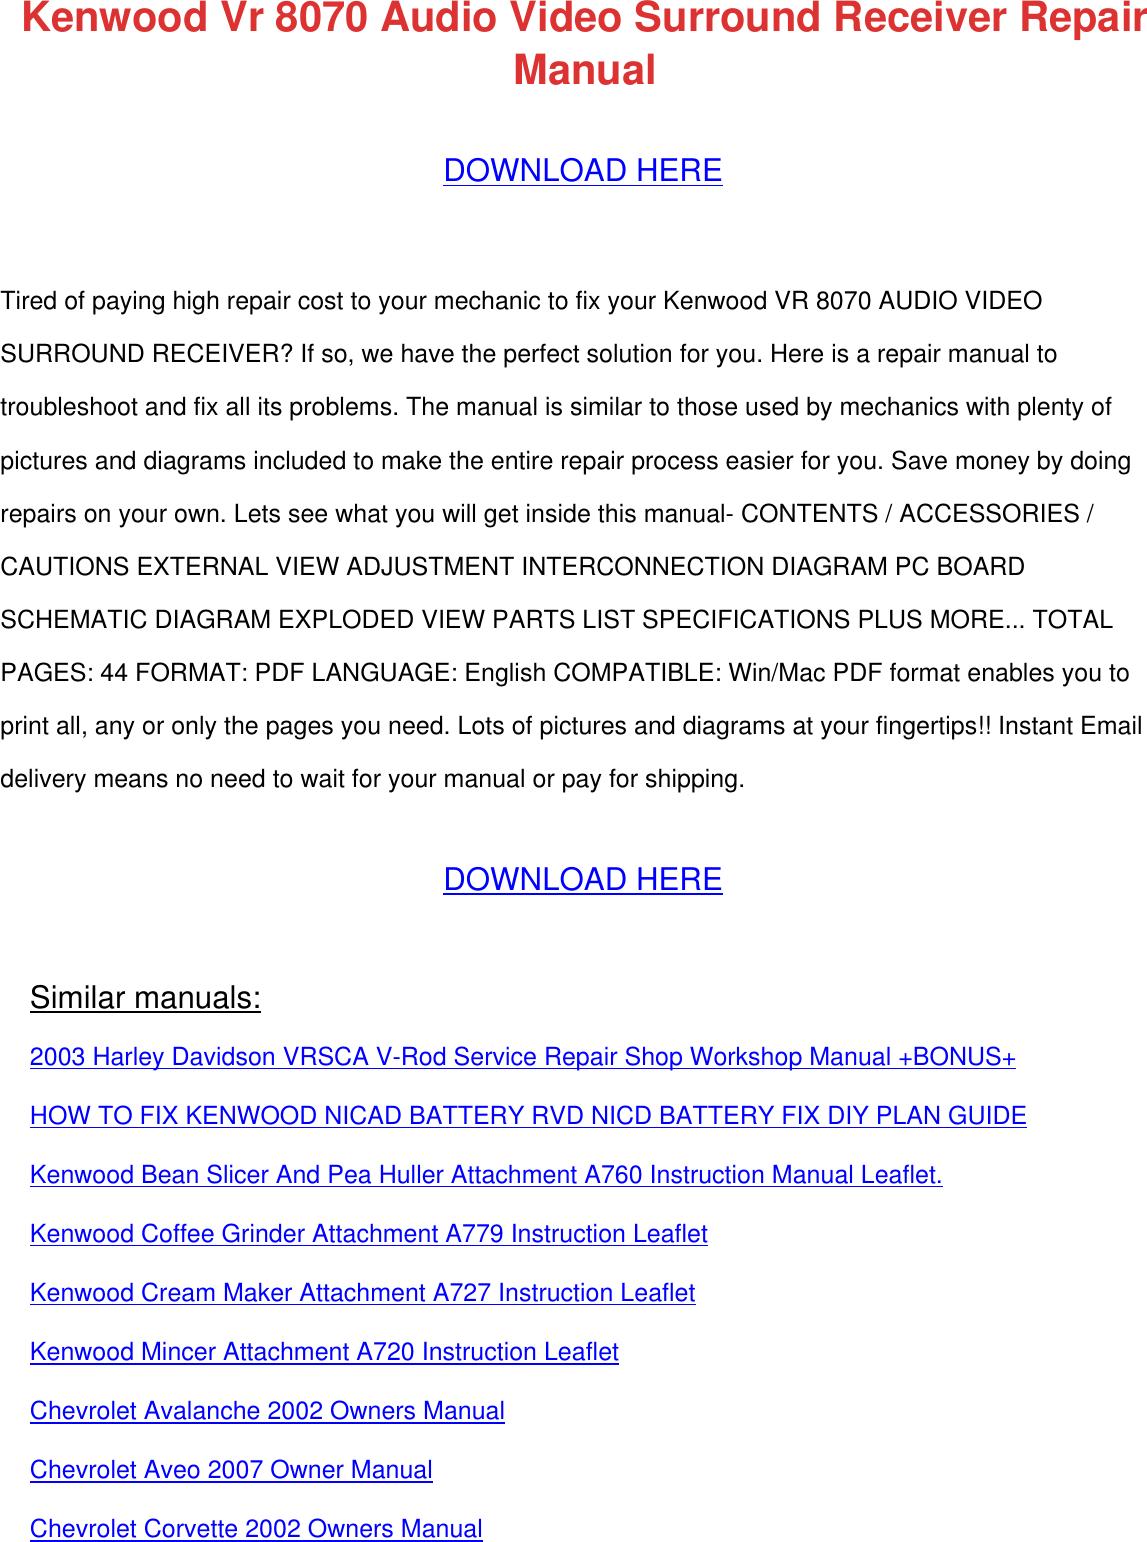 kenwood stereo receiver vr 8070 users manual  usermanual.wiki